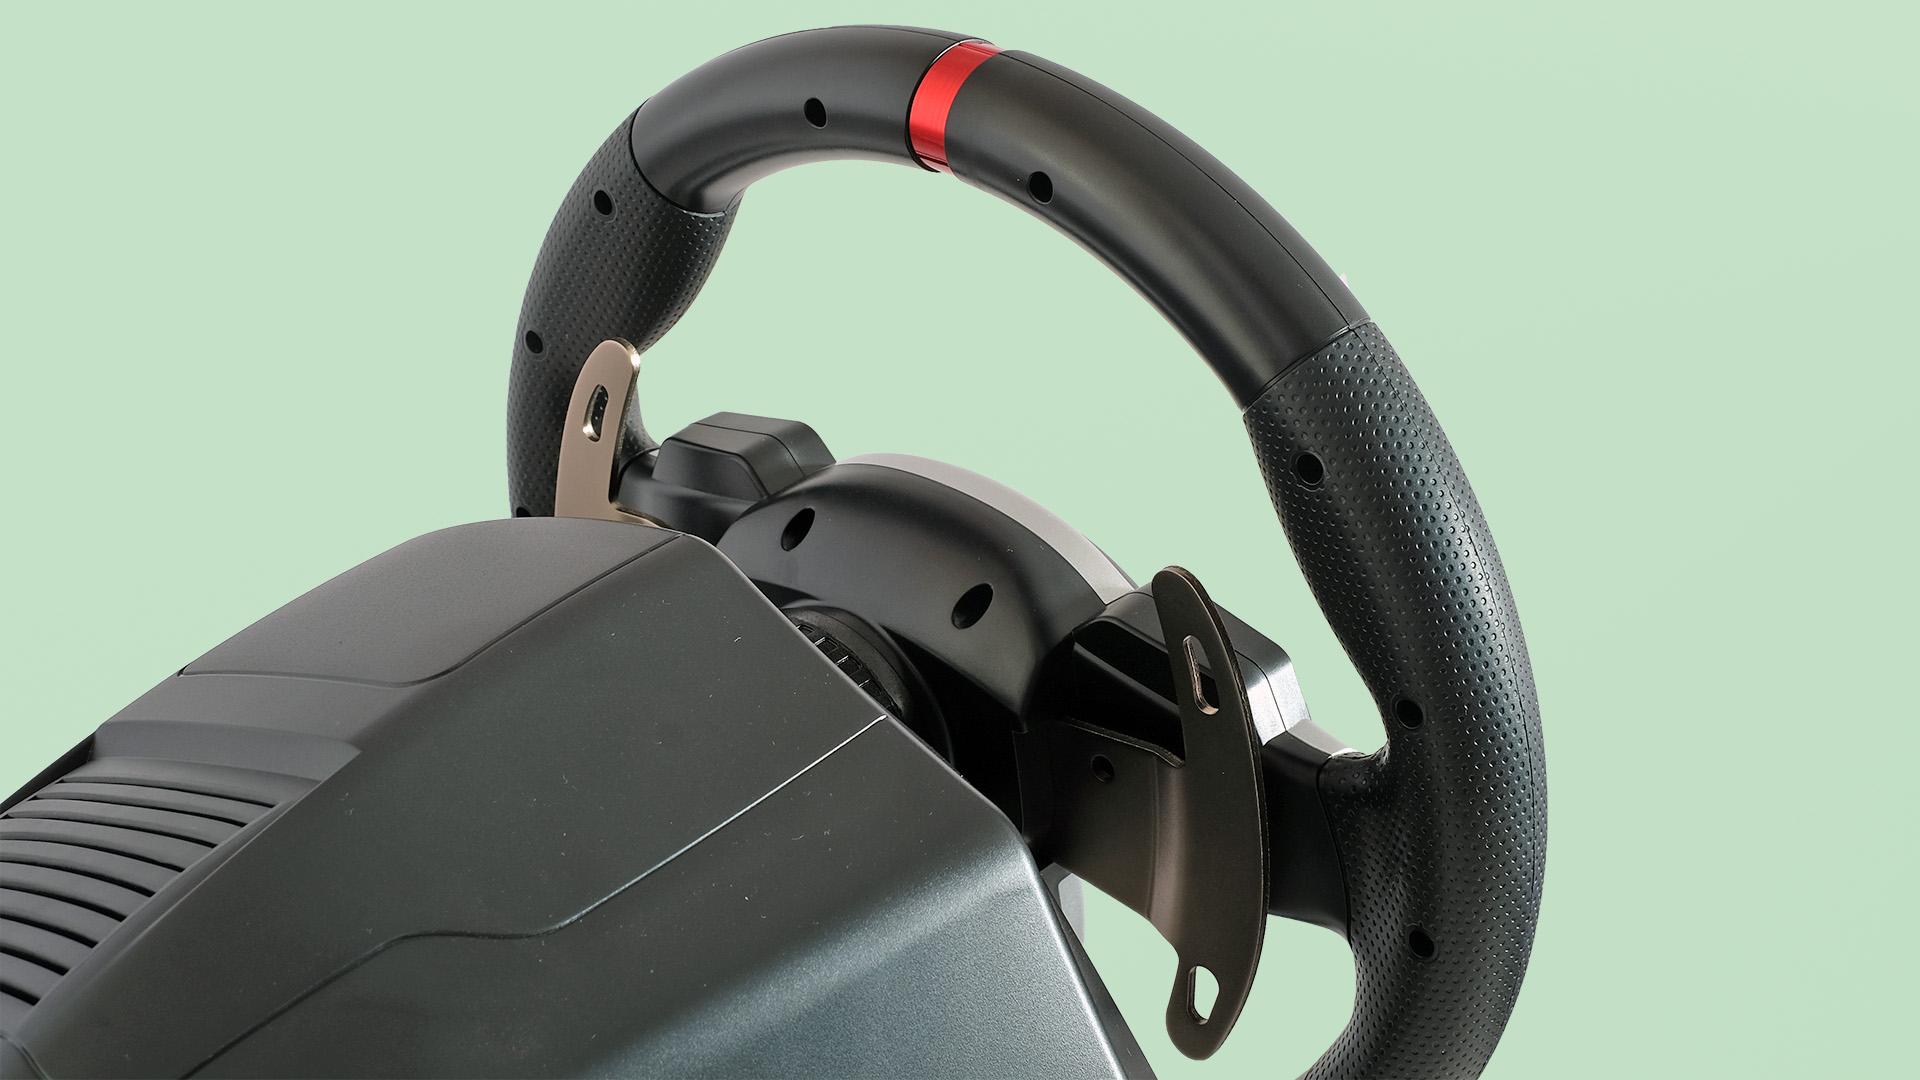 Hori Racing Wheel DLX